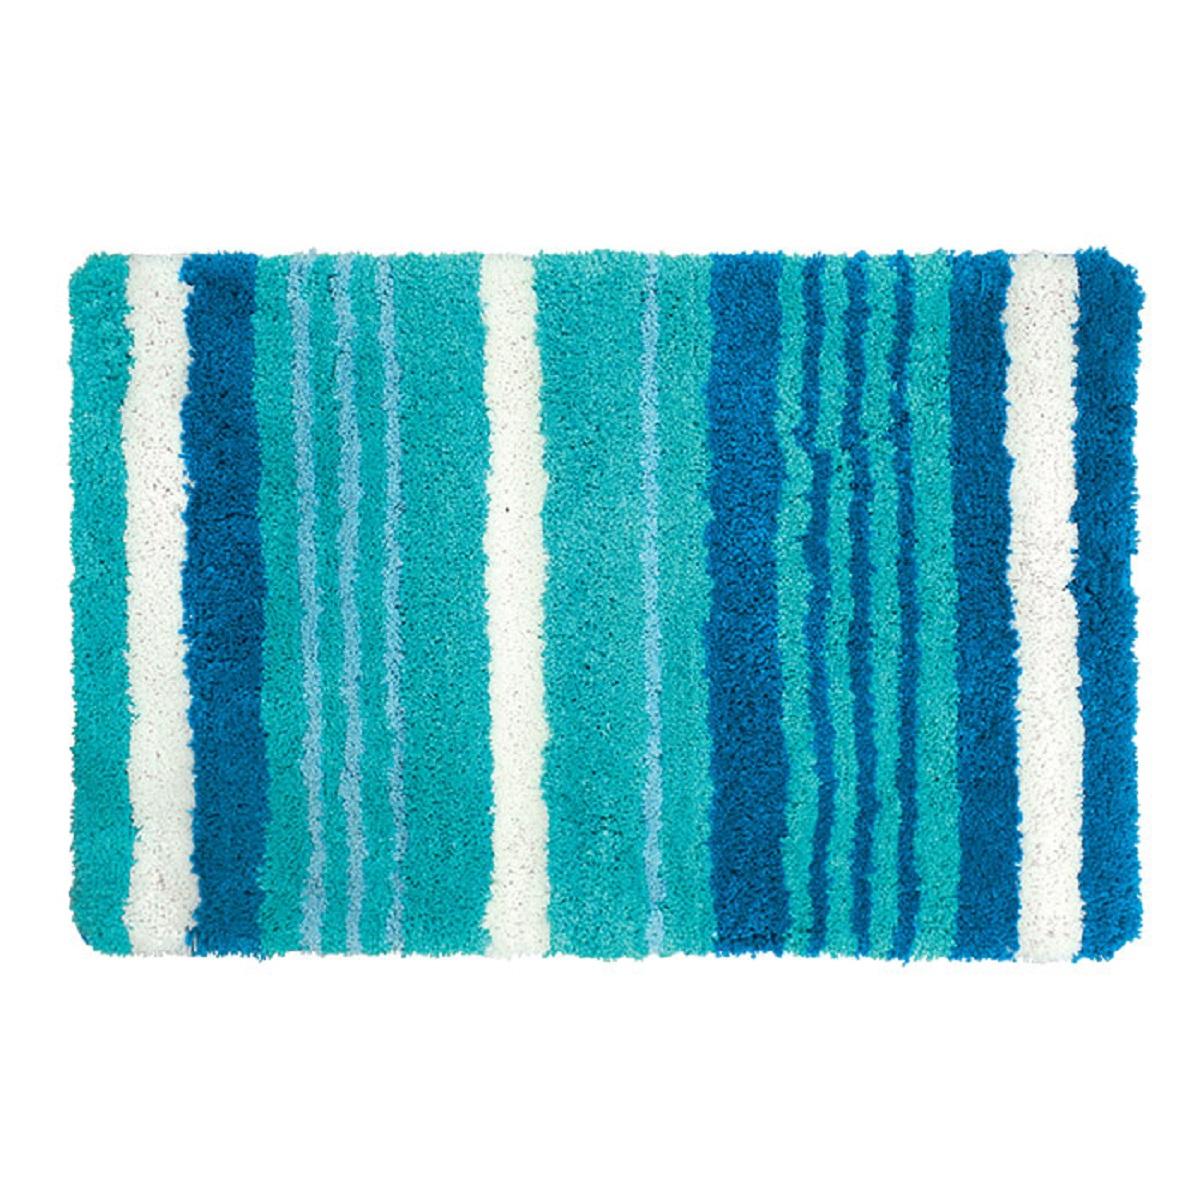 Коврик для ванной Iddis Blue Horizon, цвет: синий, 60 х 90 см коврик для ванной iddis curved lines 50x80 см 402a580i12